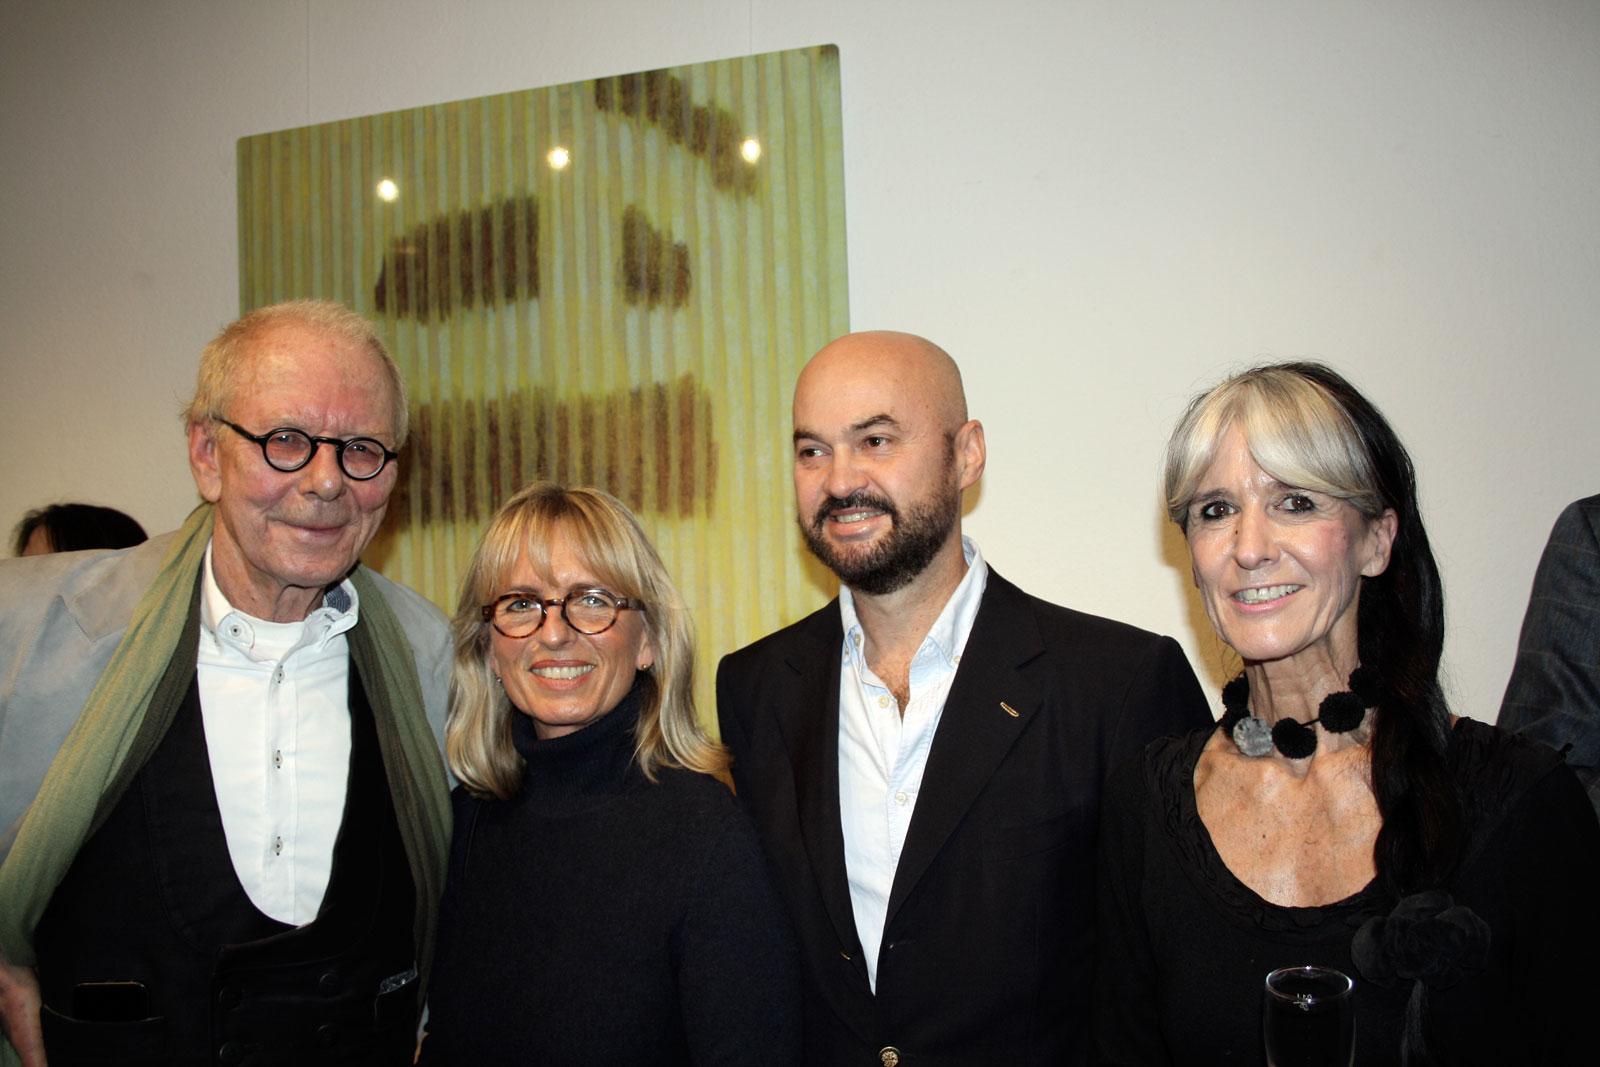 Von links nach rechts: Galerist Dr. Thomas Foerster, Marion Förster, Dr. Harald Tesan, Galeristin Kerstin Foerster (Foto: Kirsten Harder)